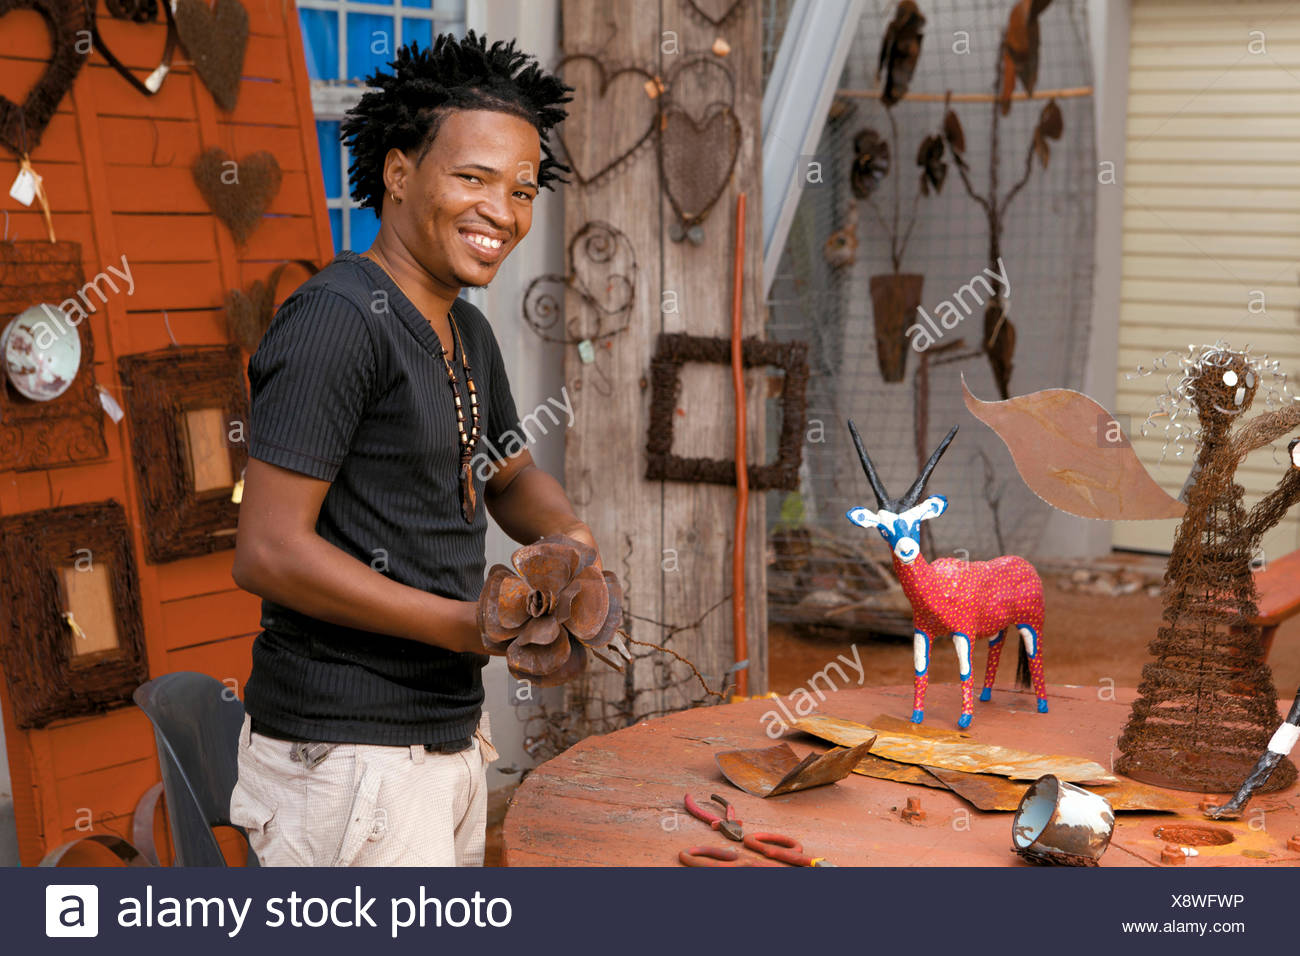 Craft Artist Stock Photo Alamy